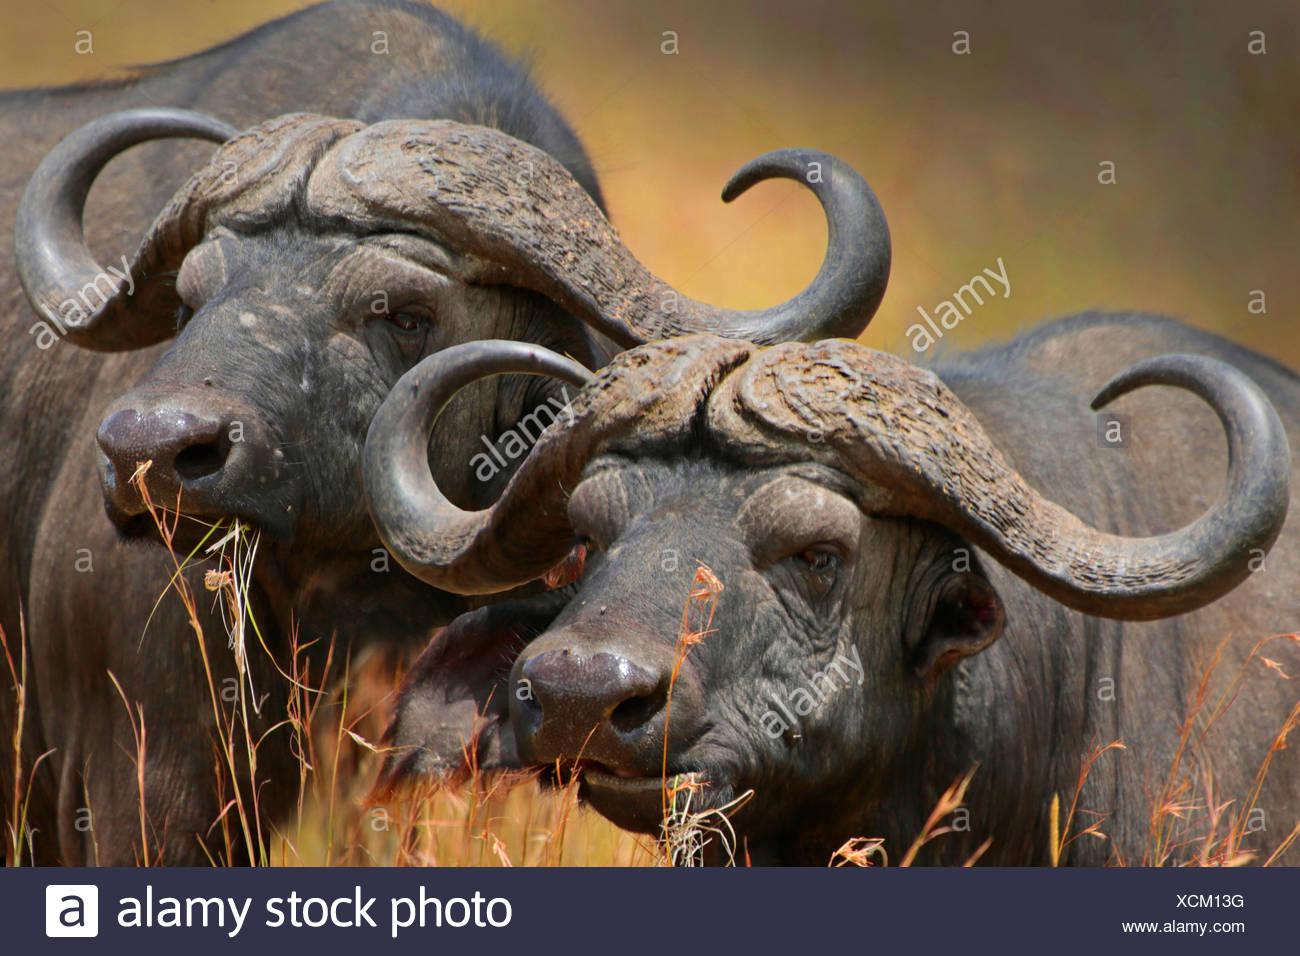 African buffalo (Syncerus caffer), portrait of two buffalos, Kenya, Masai Mara National Park - Stock Image